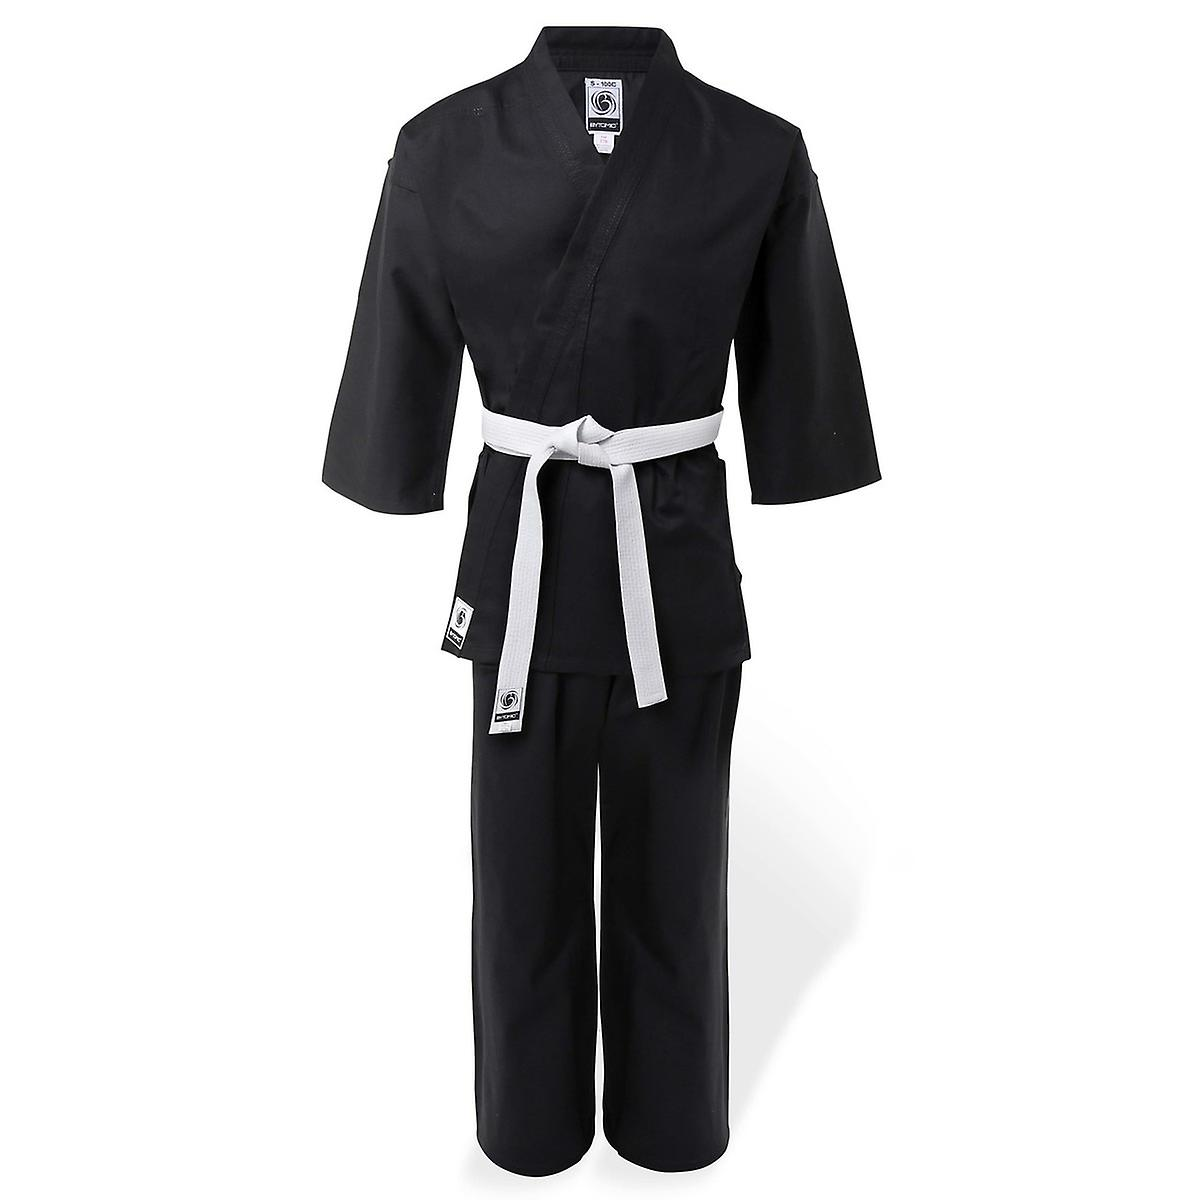 Bytomic Adult 100% Cotton Student Black Karate Uniform